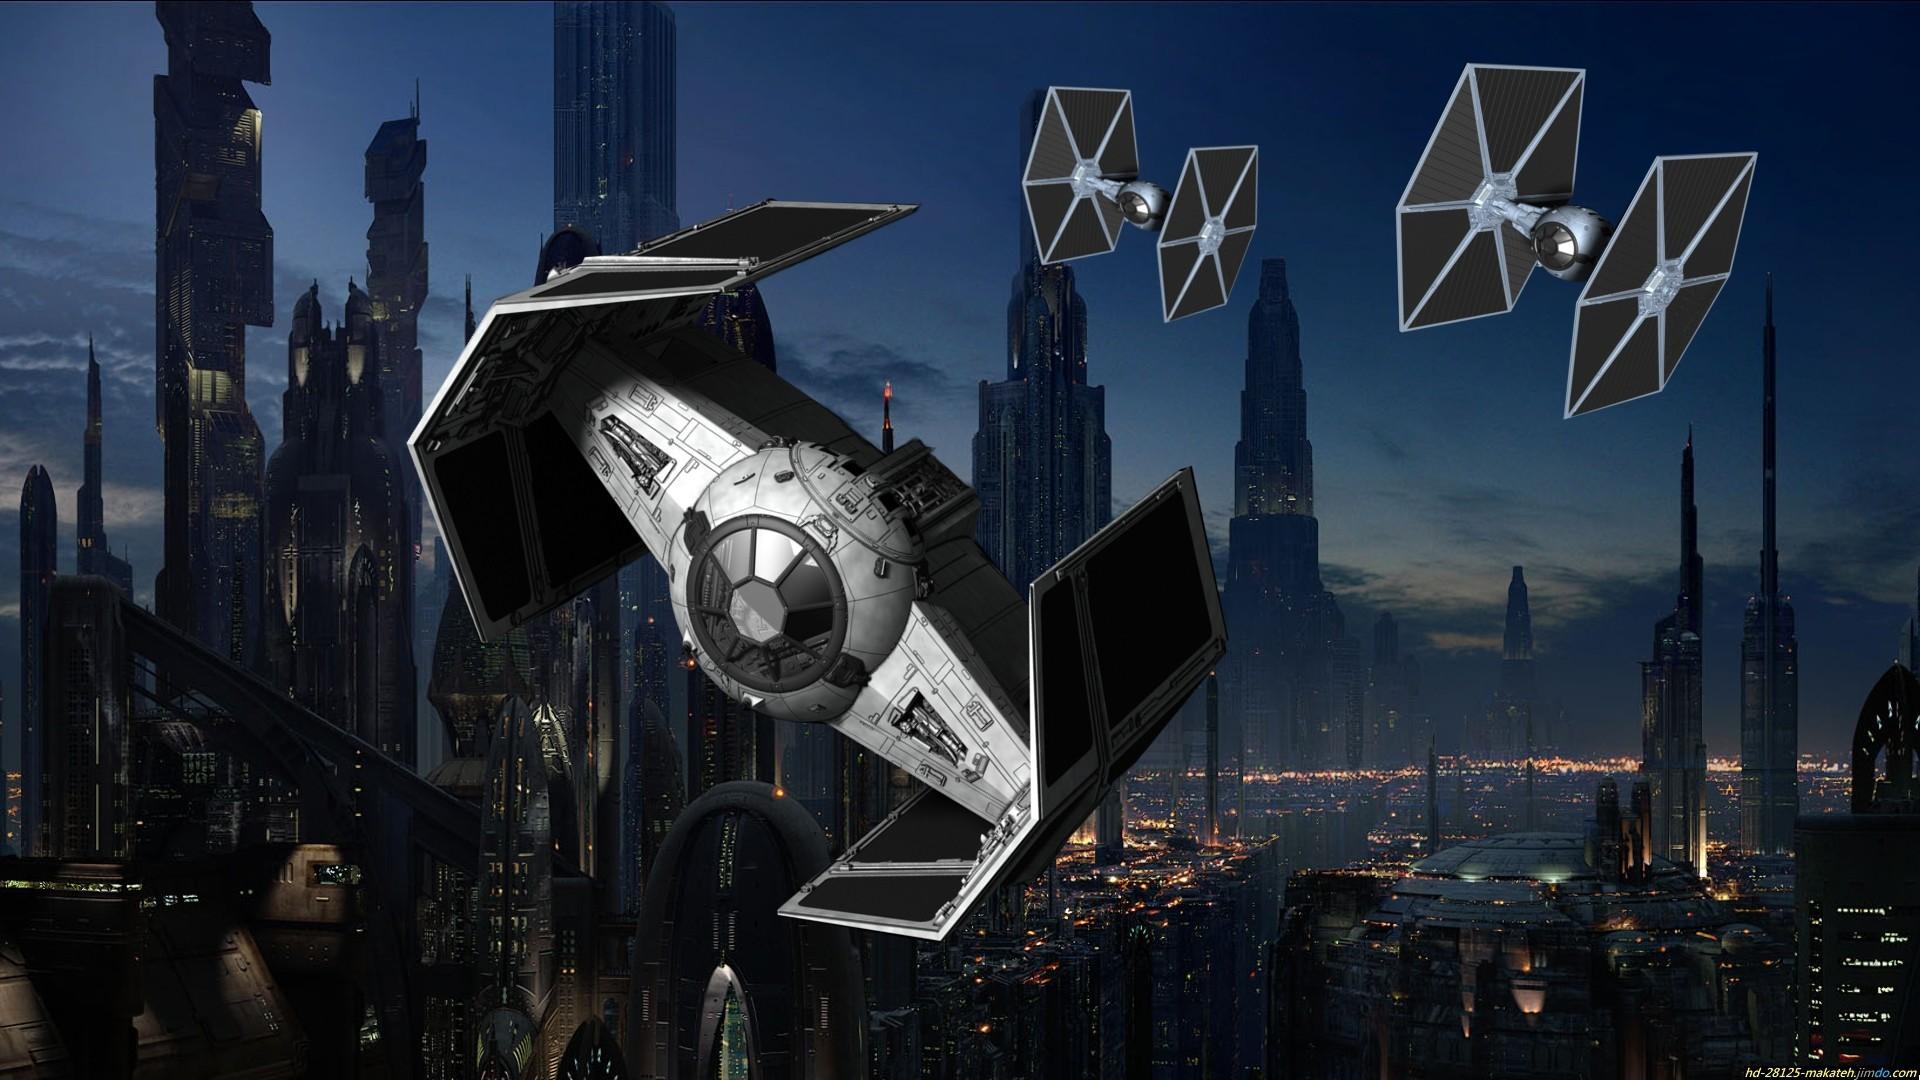 Sci Fi – Star Wars Planet Sci Fi Moon People Spaceship Space TIE Fighter  Wallpaper